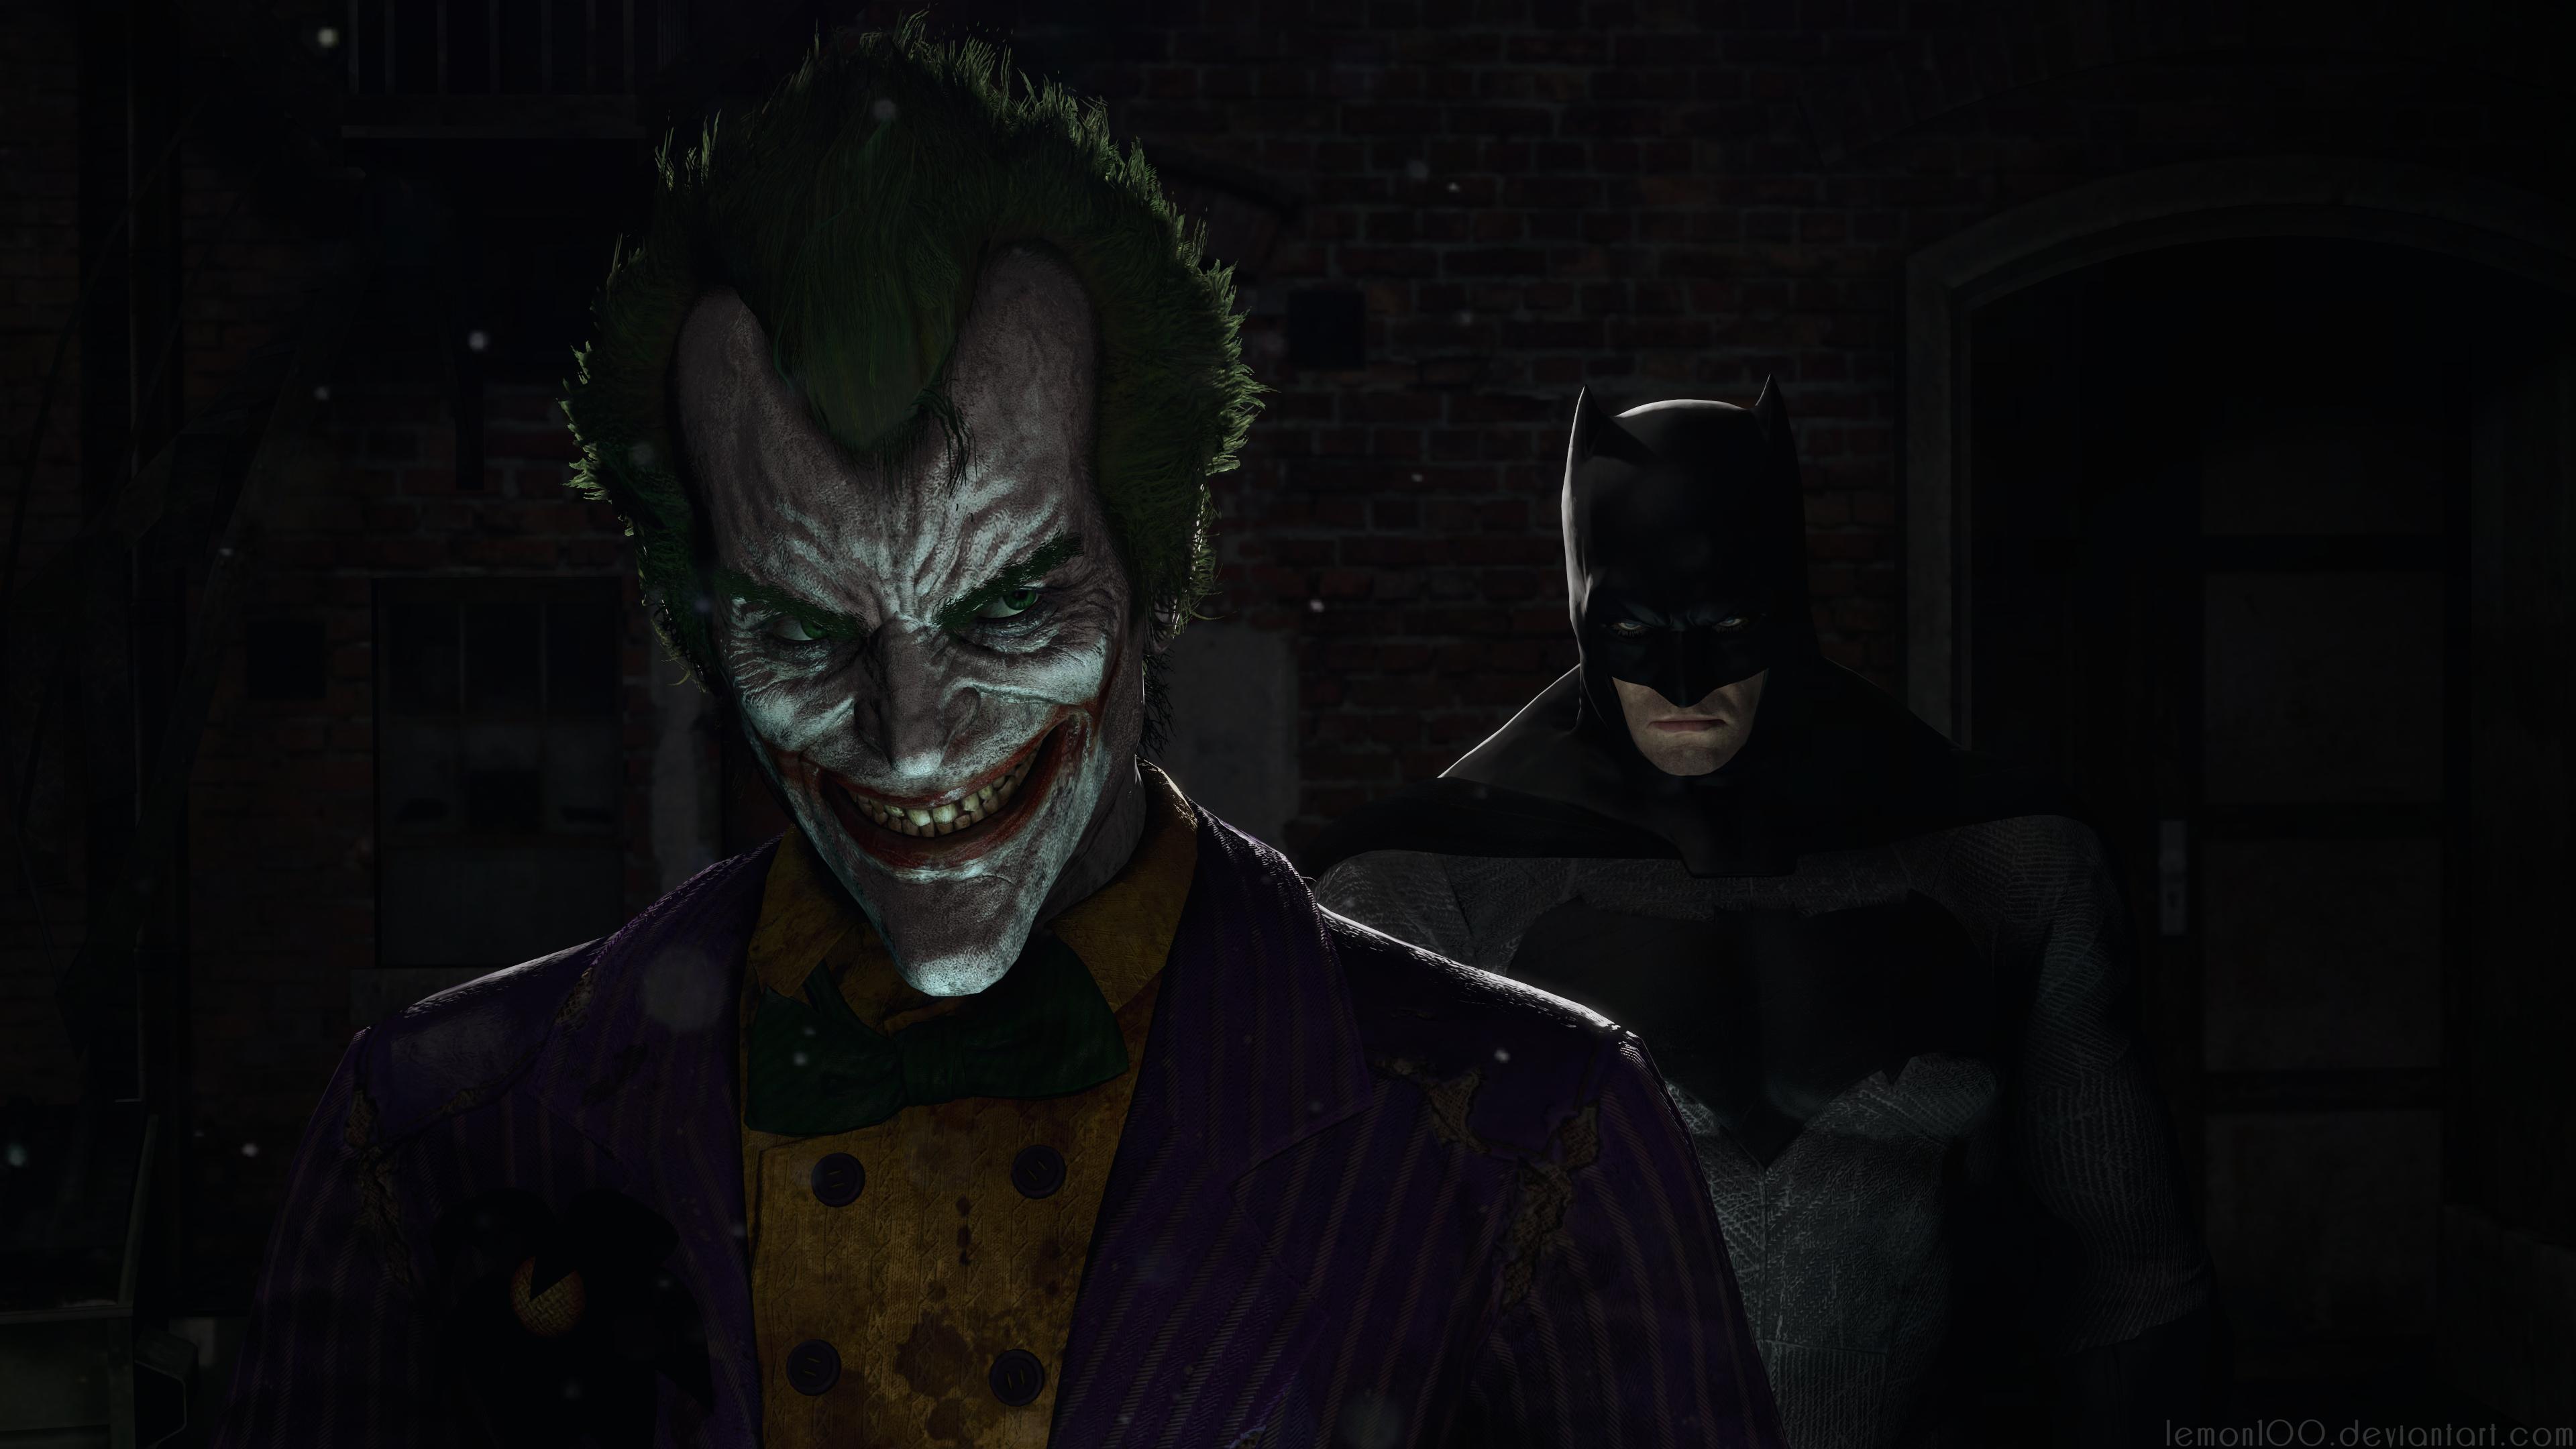 Batman Joker X Reader Lemon Image Mag